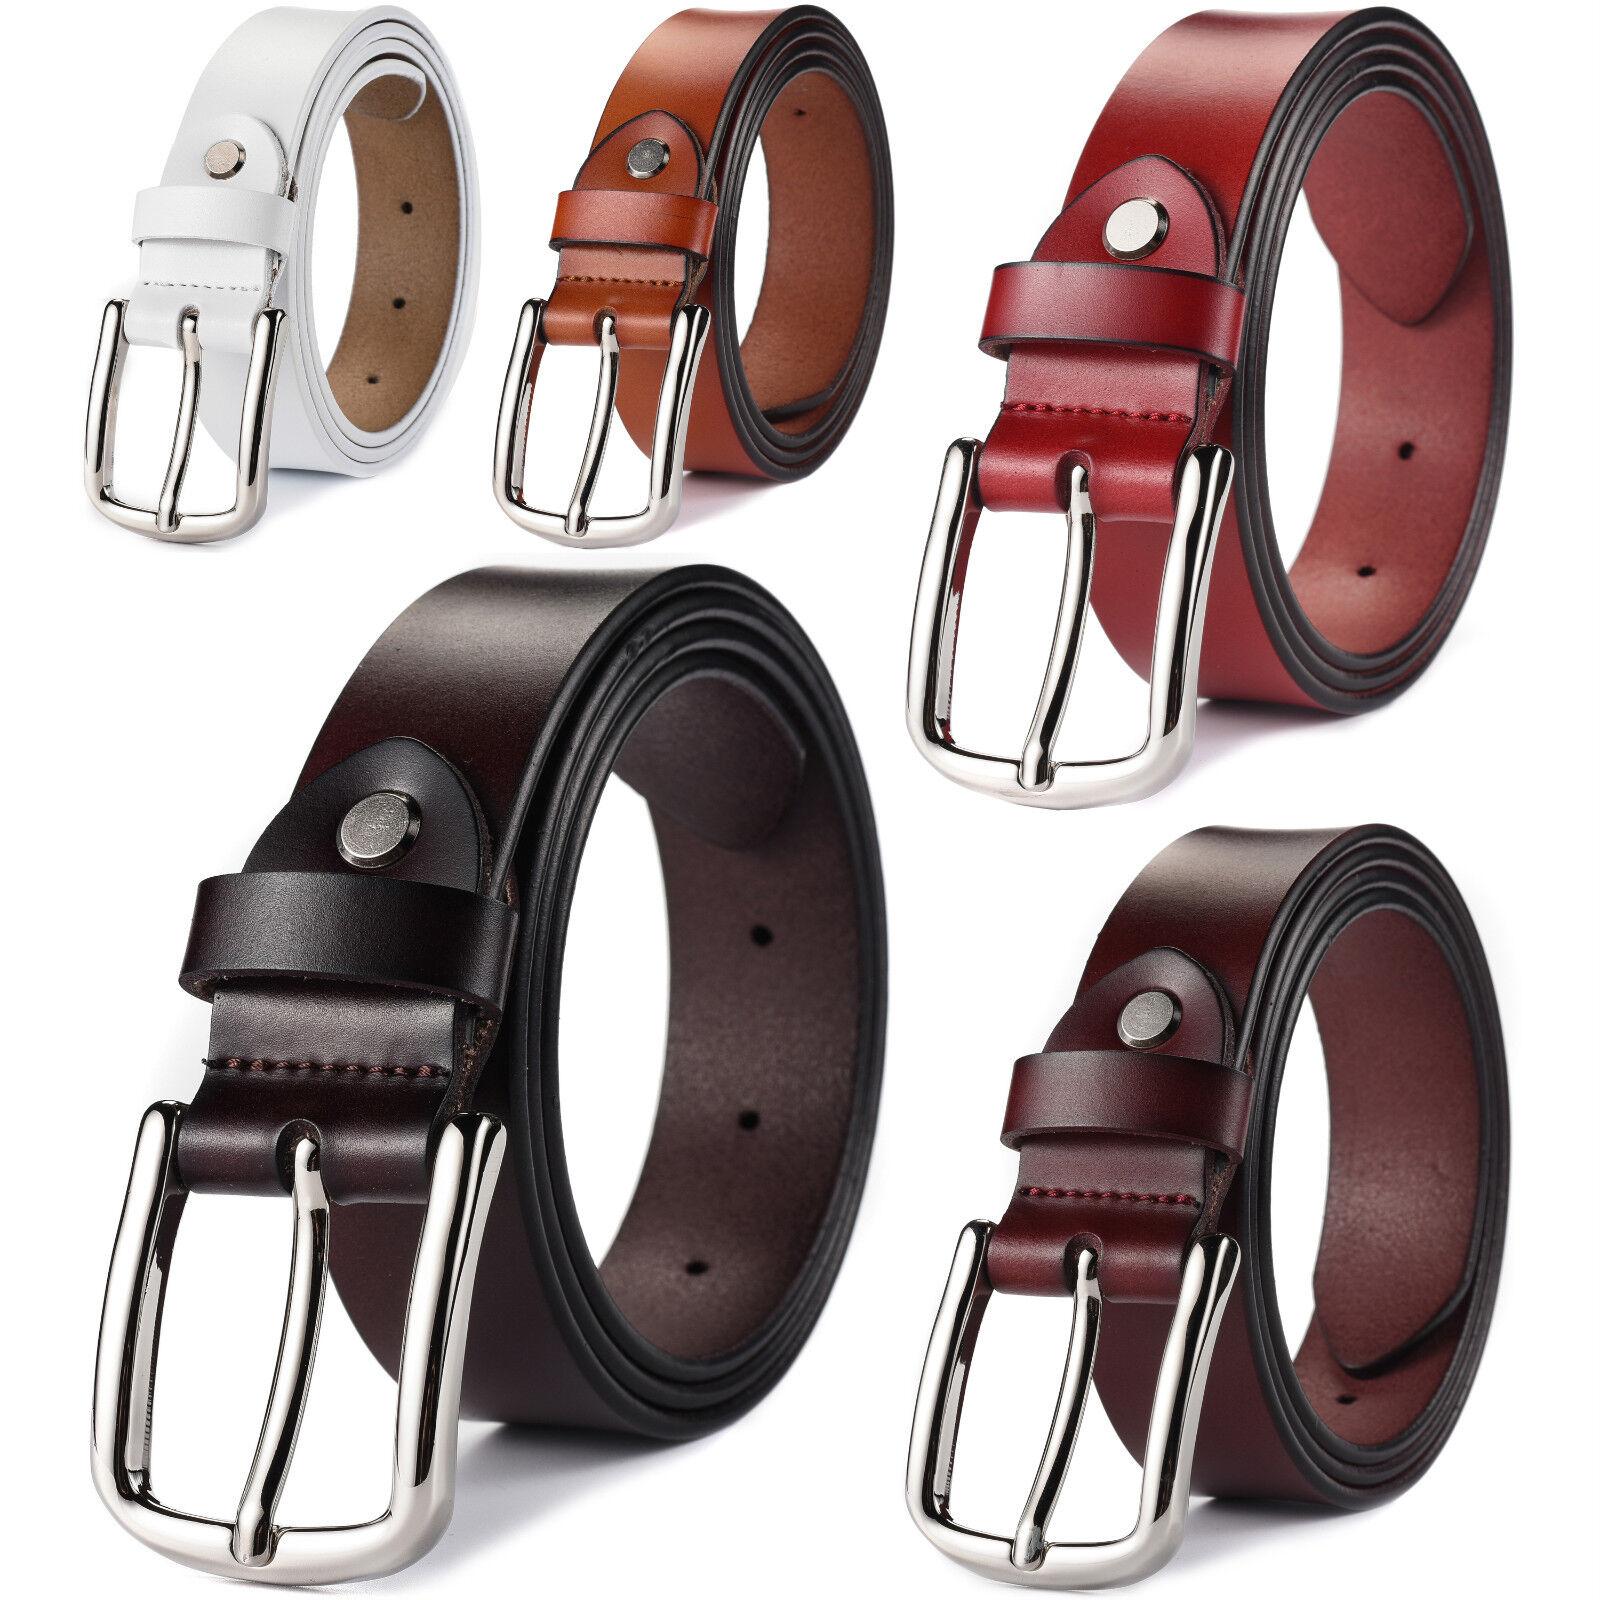 Women's Classic Metal Buckle Handcrafted Genuine Leather Belt Belts